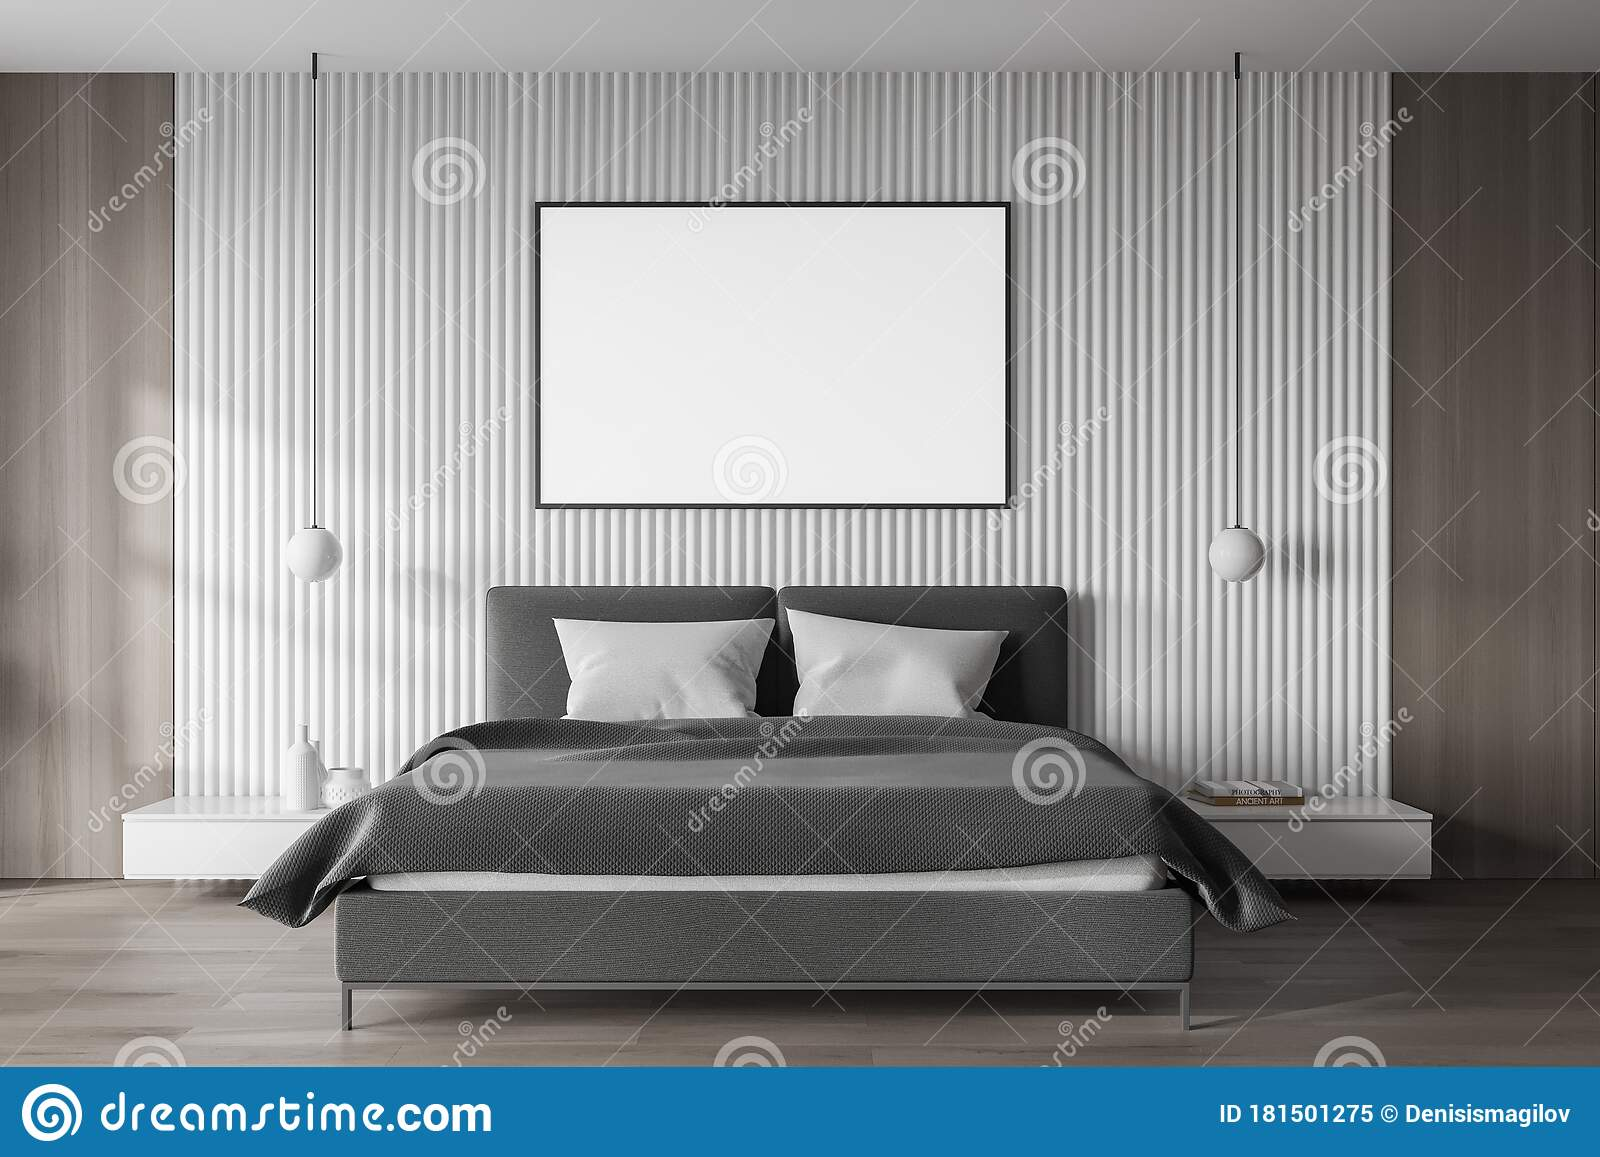 White Master Bedroom With Poster Stock Illustration Illustration Of Lifestyle Estate 181501275